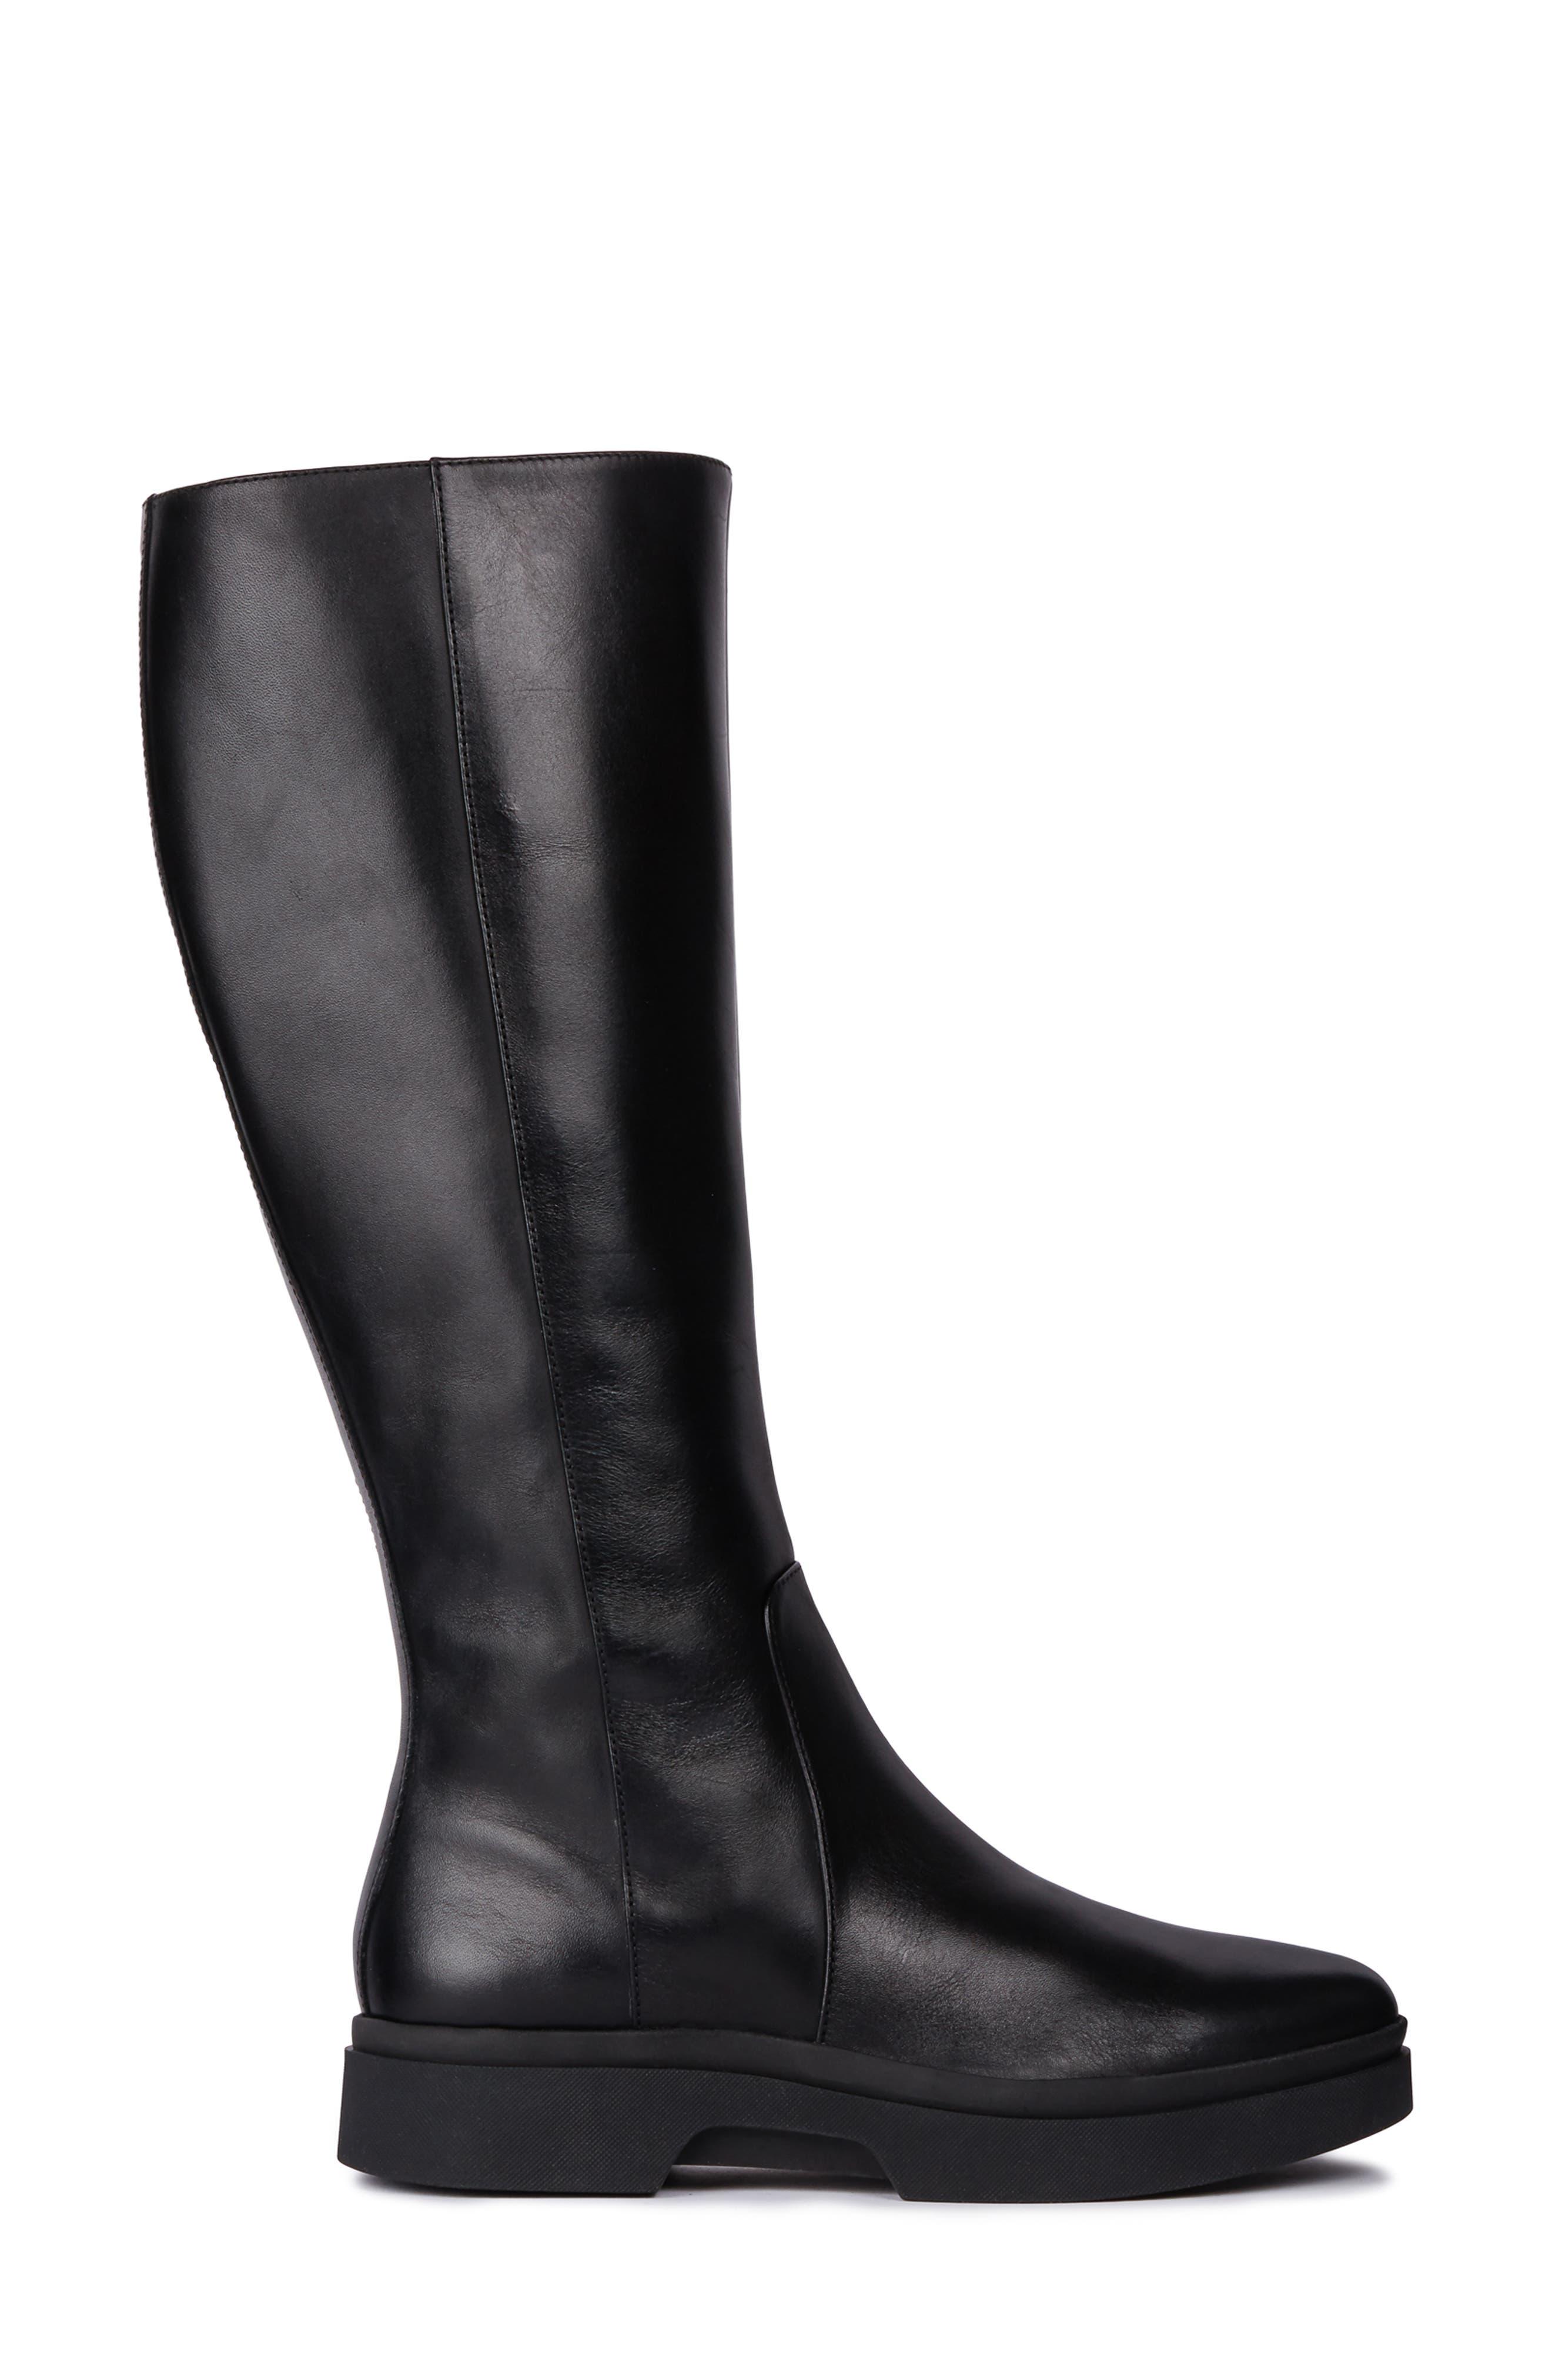 Myluse Knee High Platform Waterproof Boot,                             Alternate thumbnail 3, color,                             BLACK LEATHER